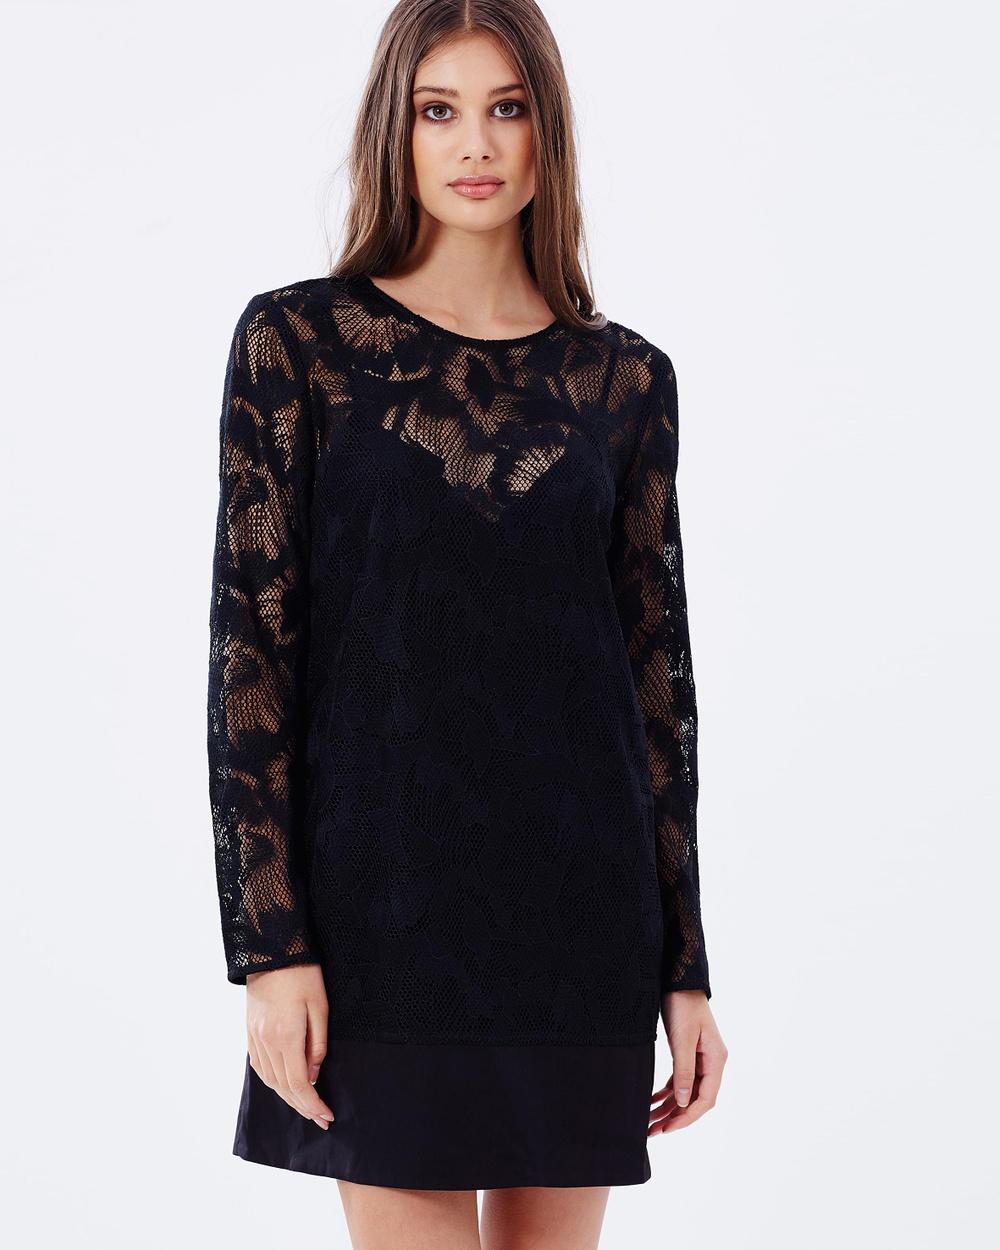 Isla Layback Long Sleeve Dress Dresses Black Layback Long Sleeve Dress